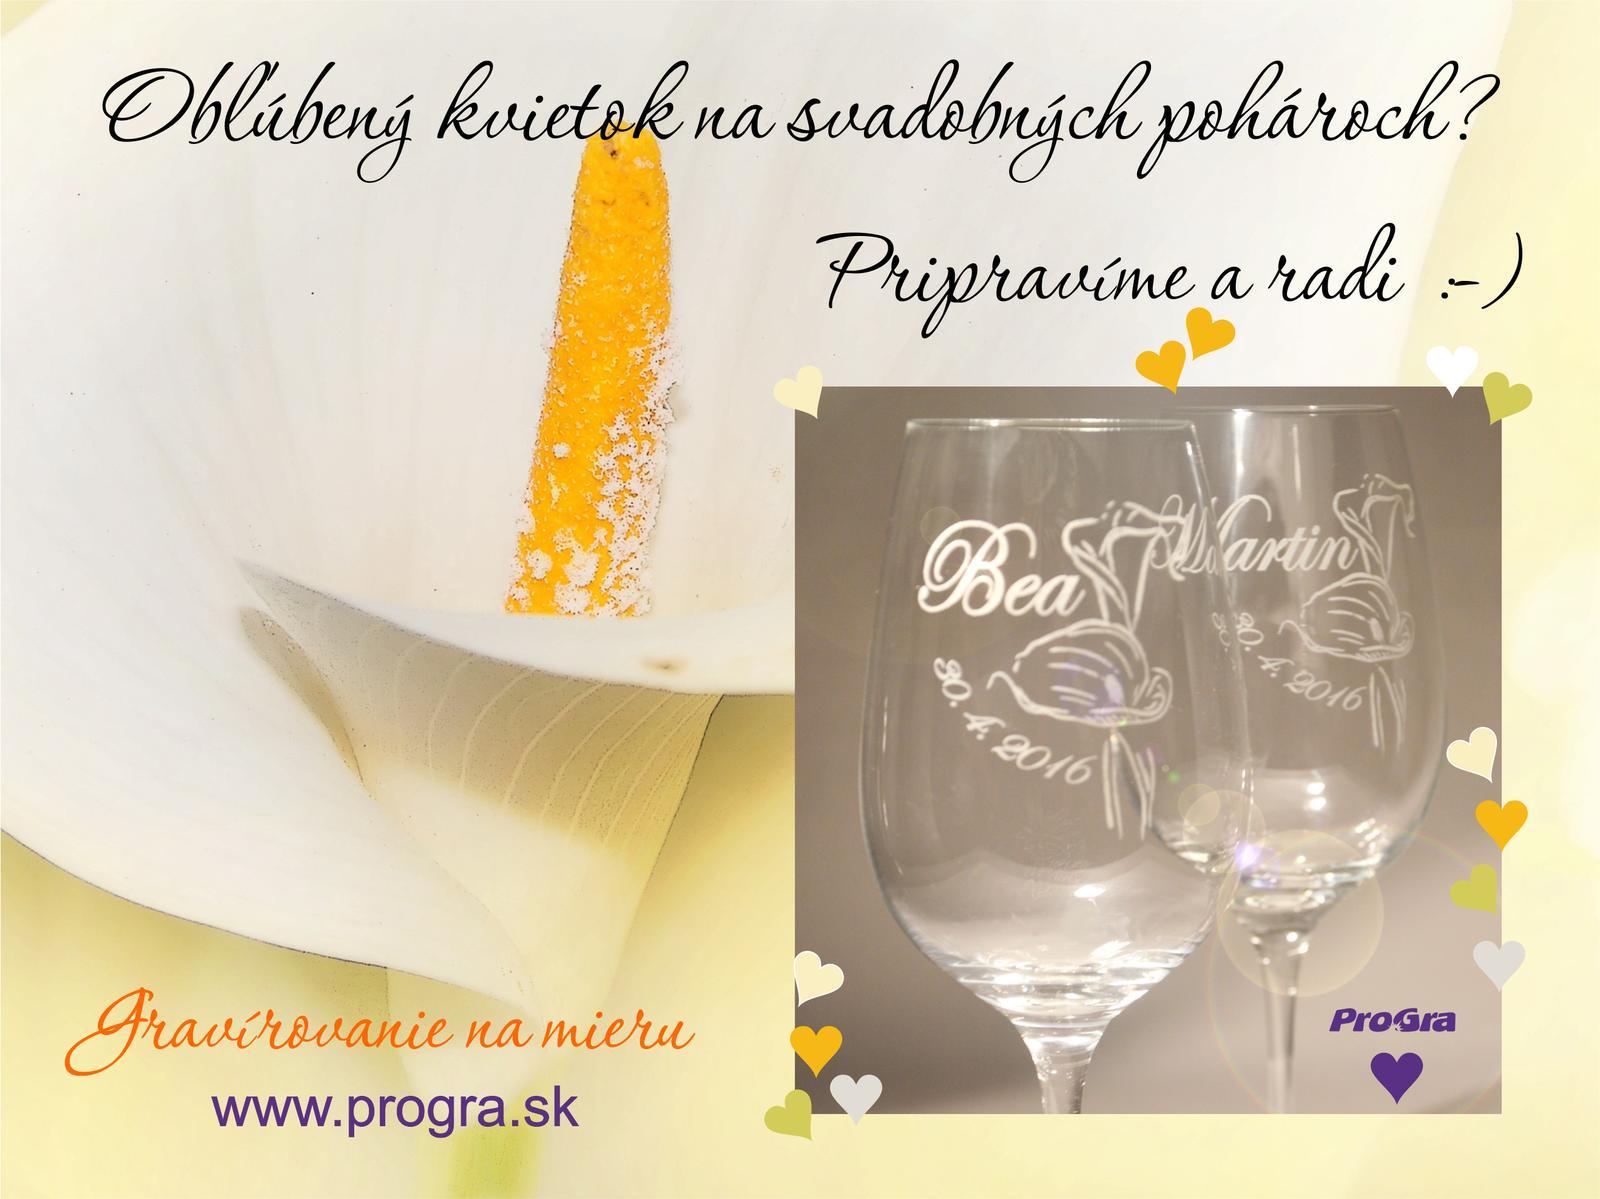 Svatební skleničky - kontaktujte nás s Vašou predstavou: prograsro@gmail.com